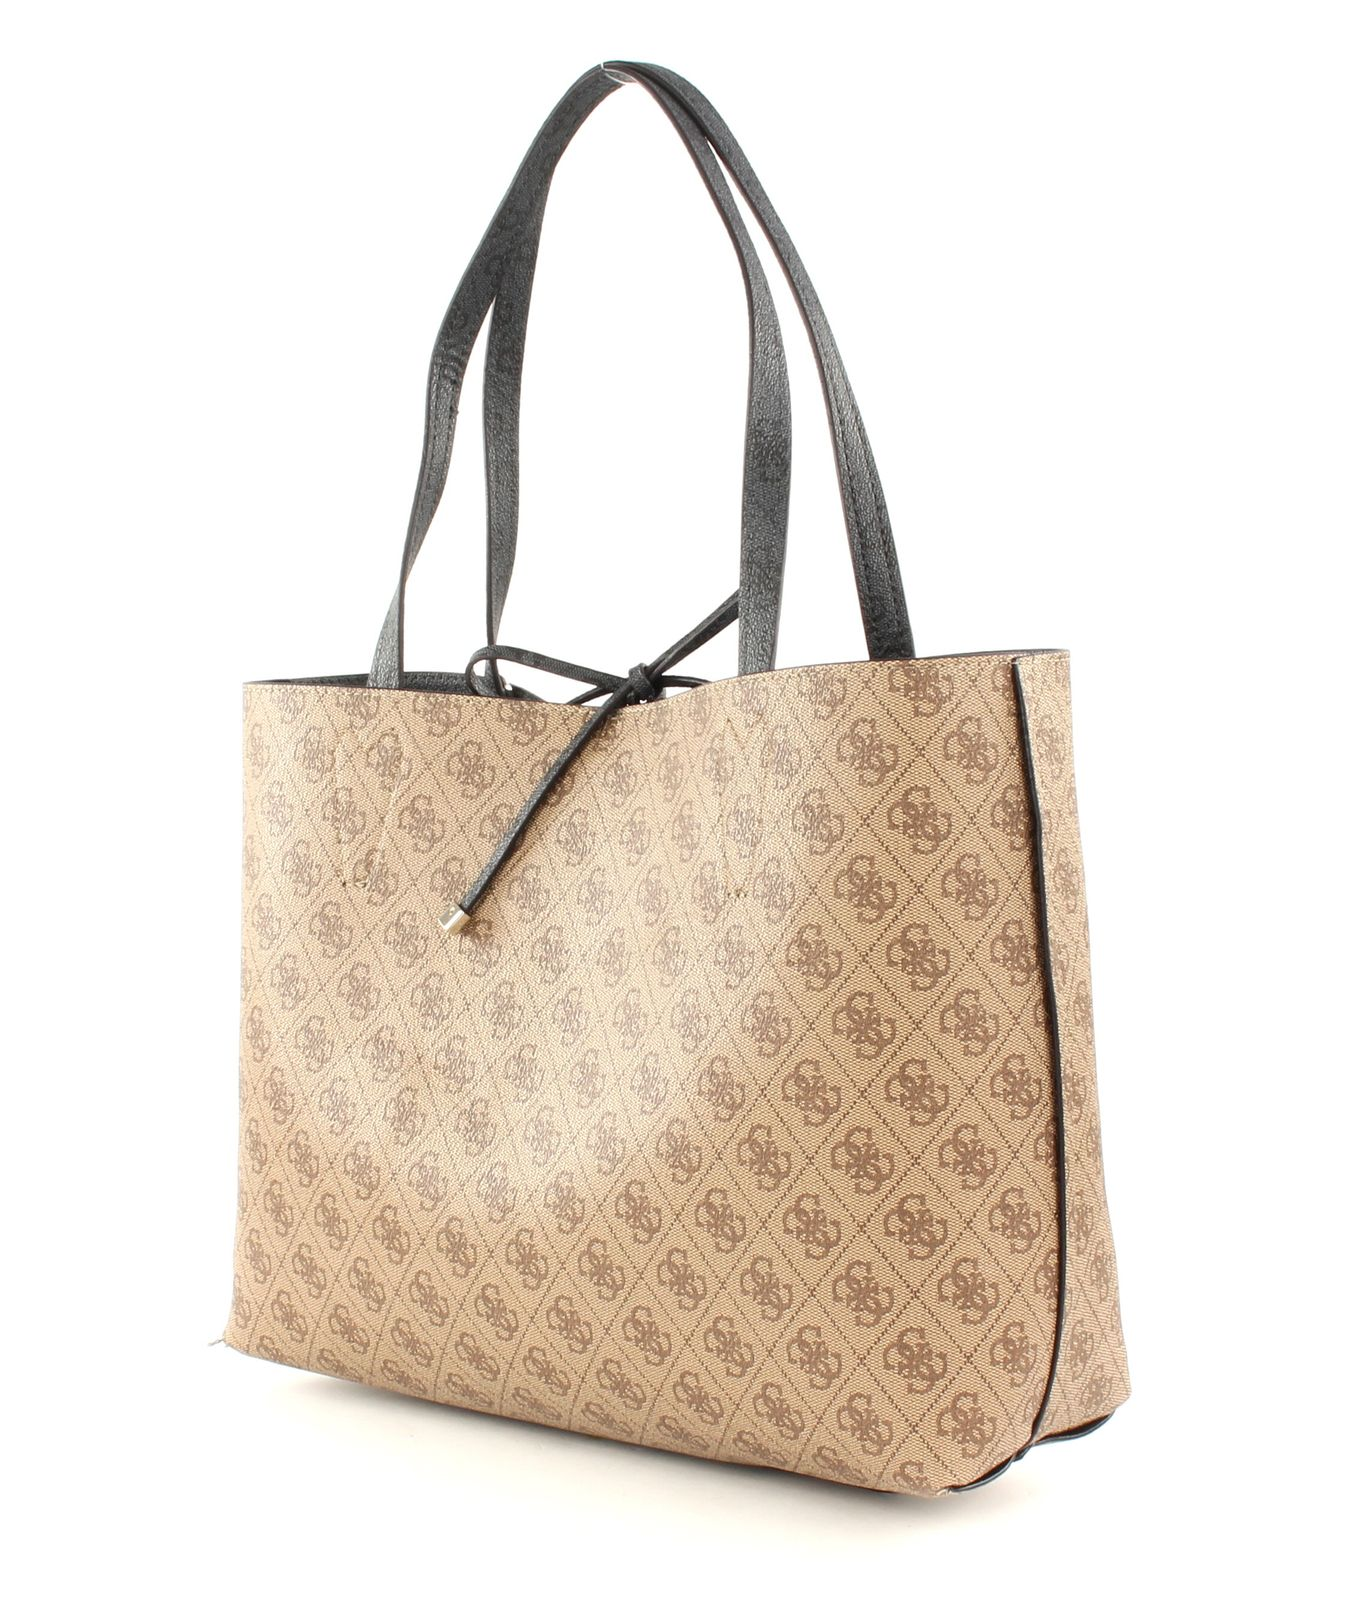 GUESS Damen Handtasche Bobbi Inside Out Taupe Clutches